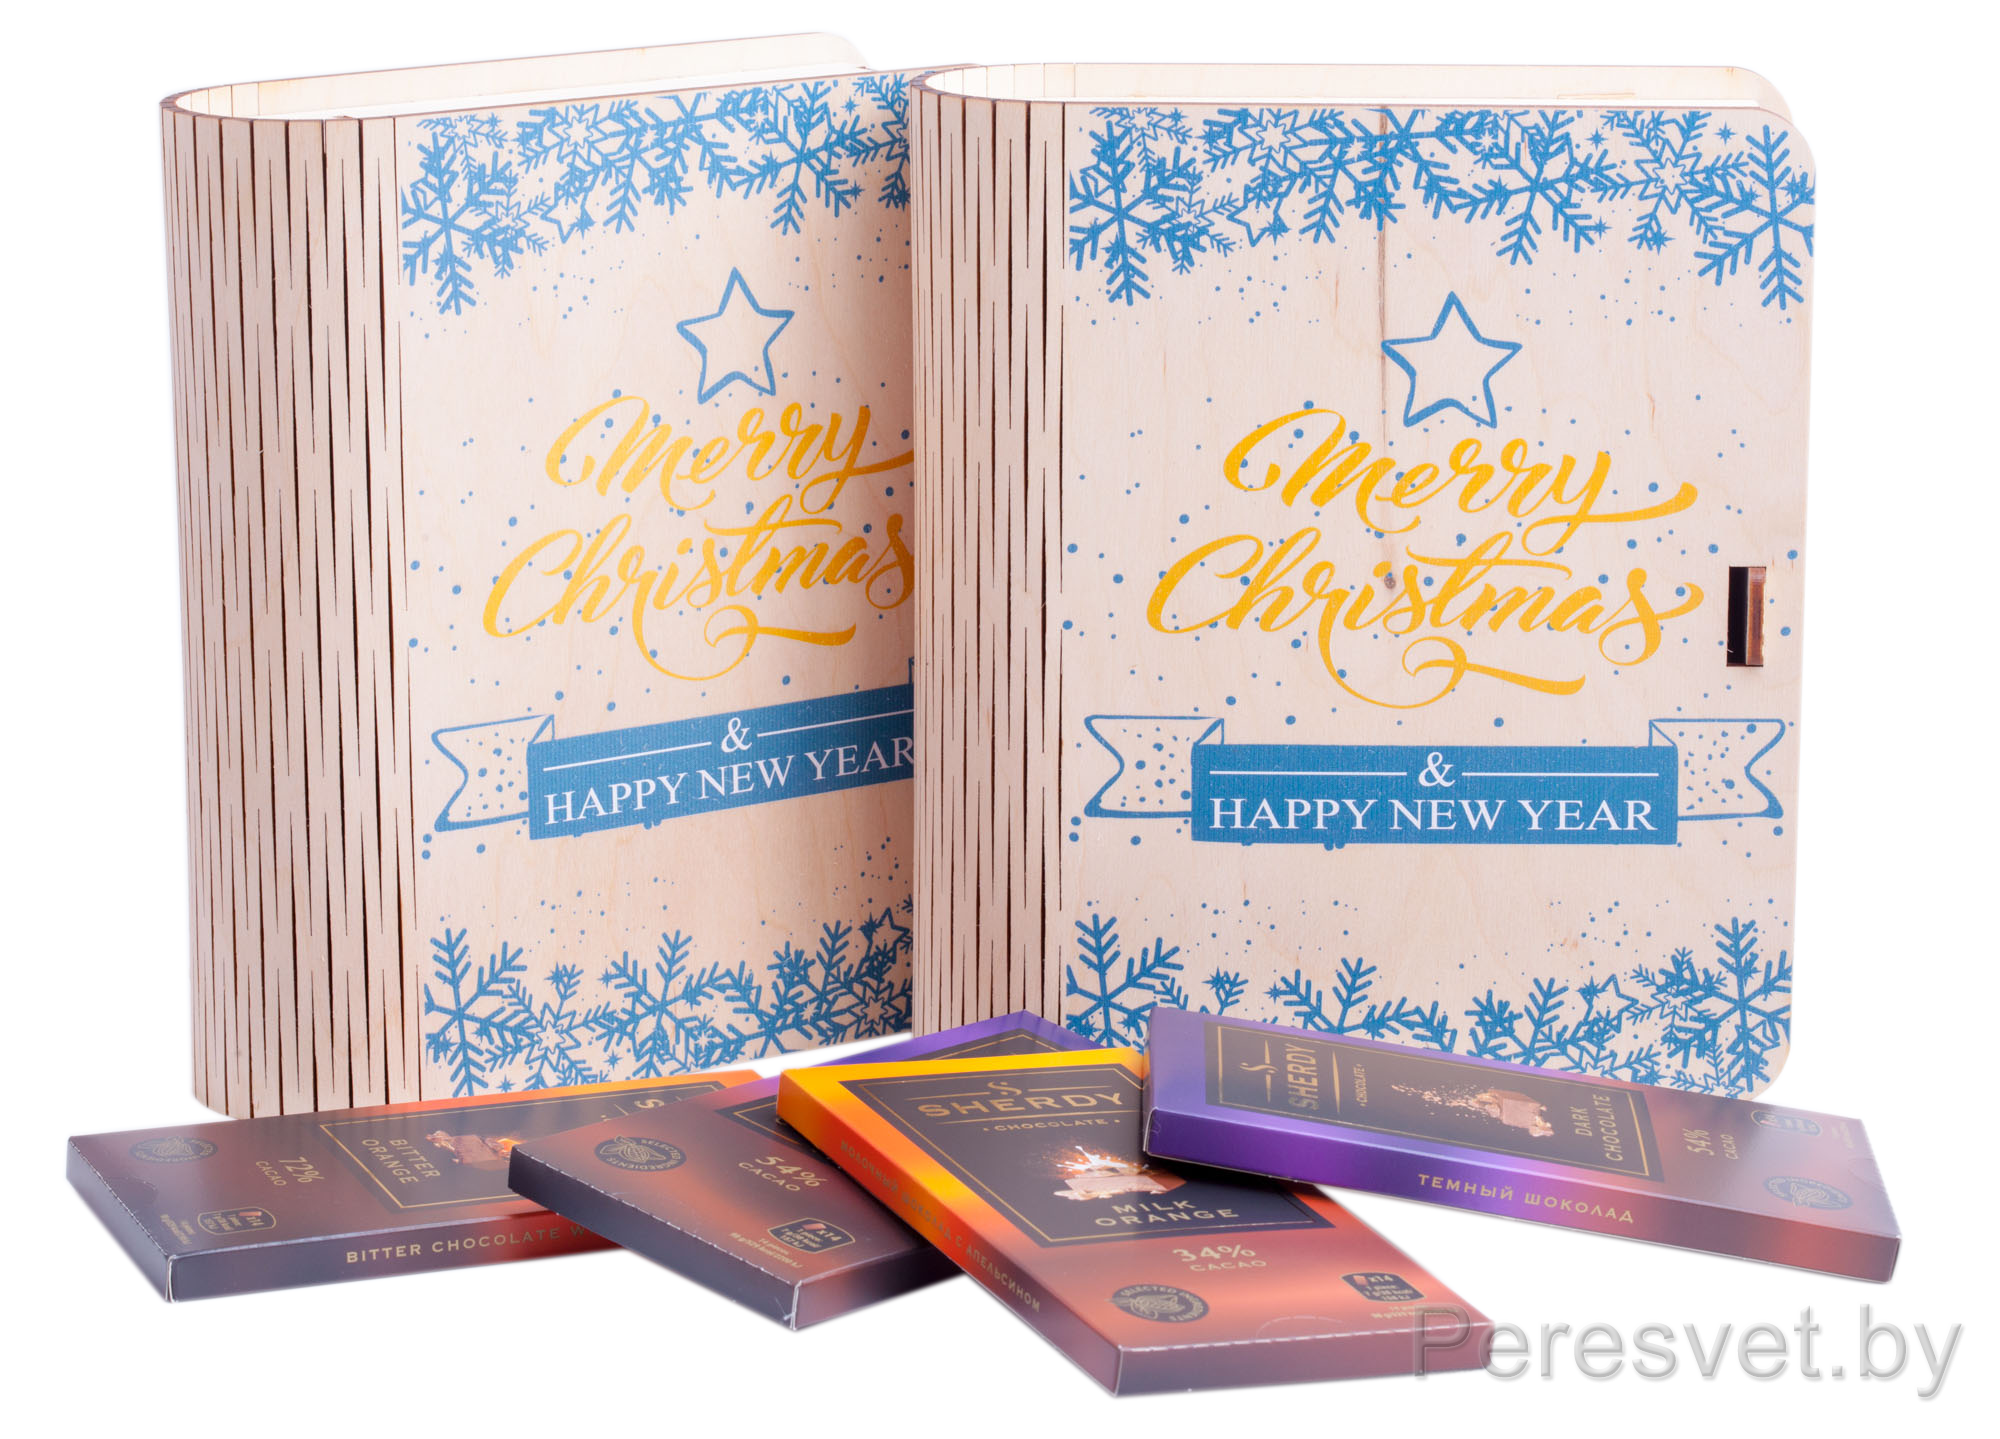 Корпоративный подарок под конфеты Merry Christmas на peresvet.by